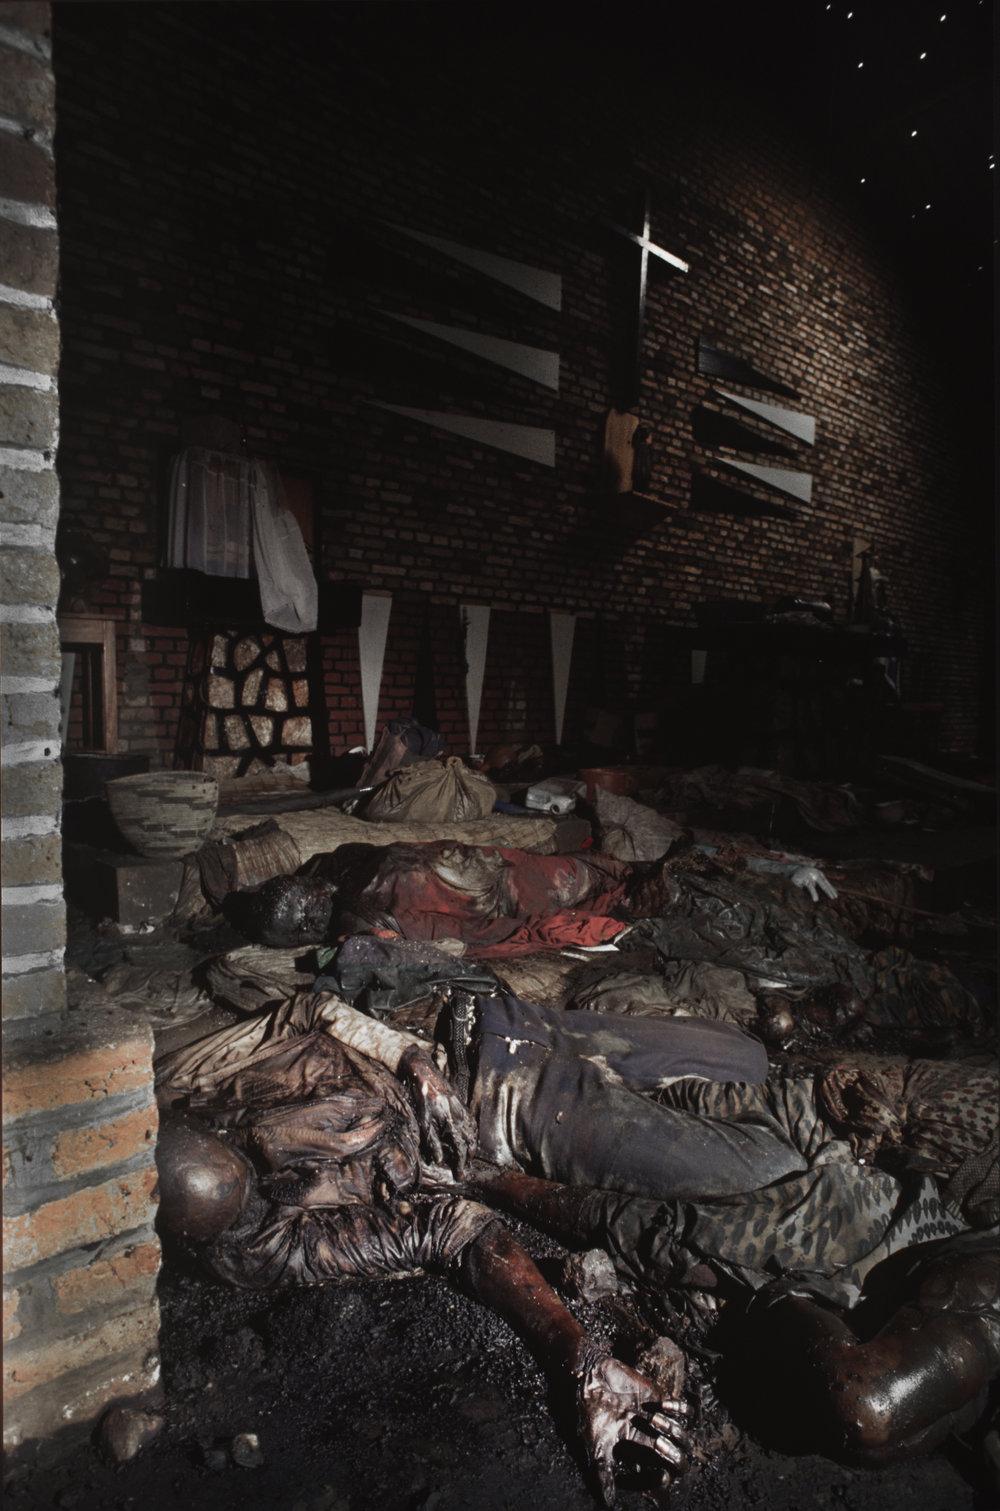 Corpses of Tutu massacre victims [inside] a Belgian Catholic Church in Rukara. Genocide, Rwanda, 1994